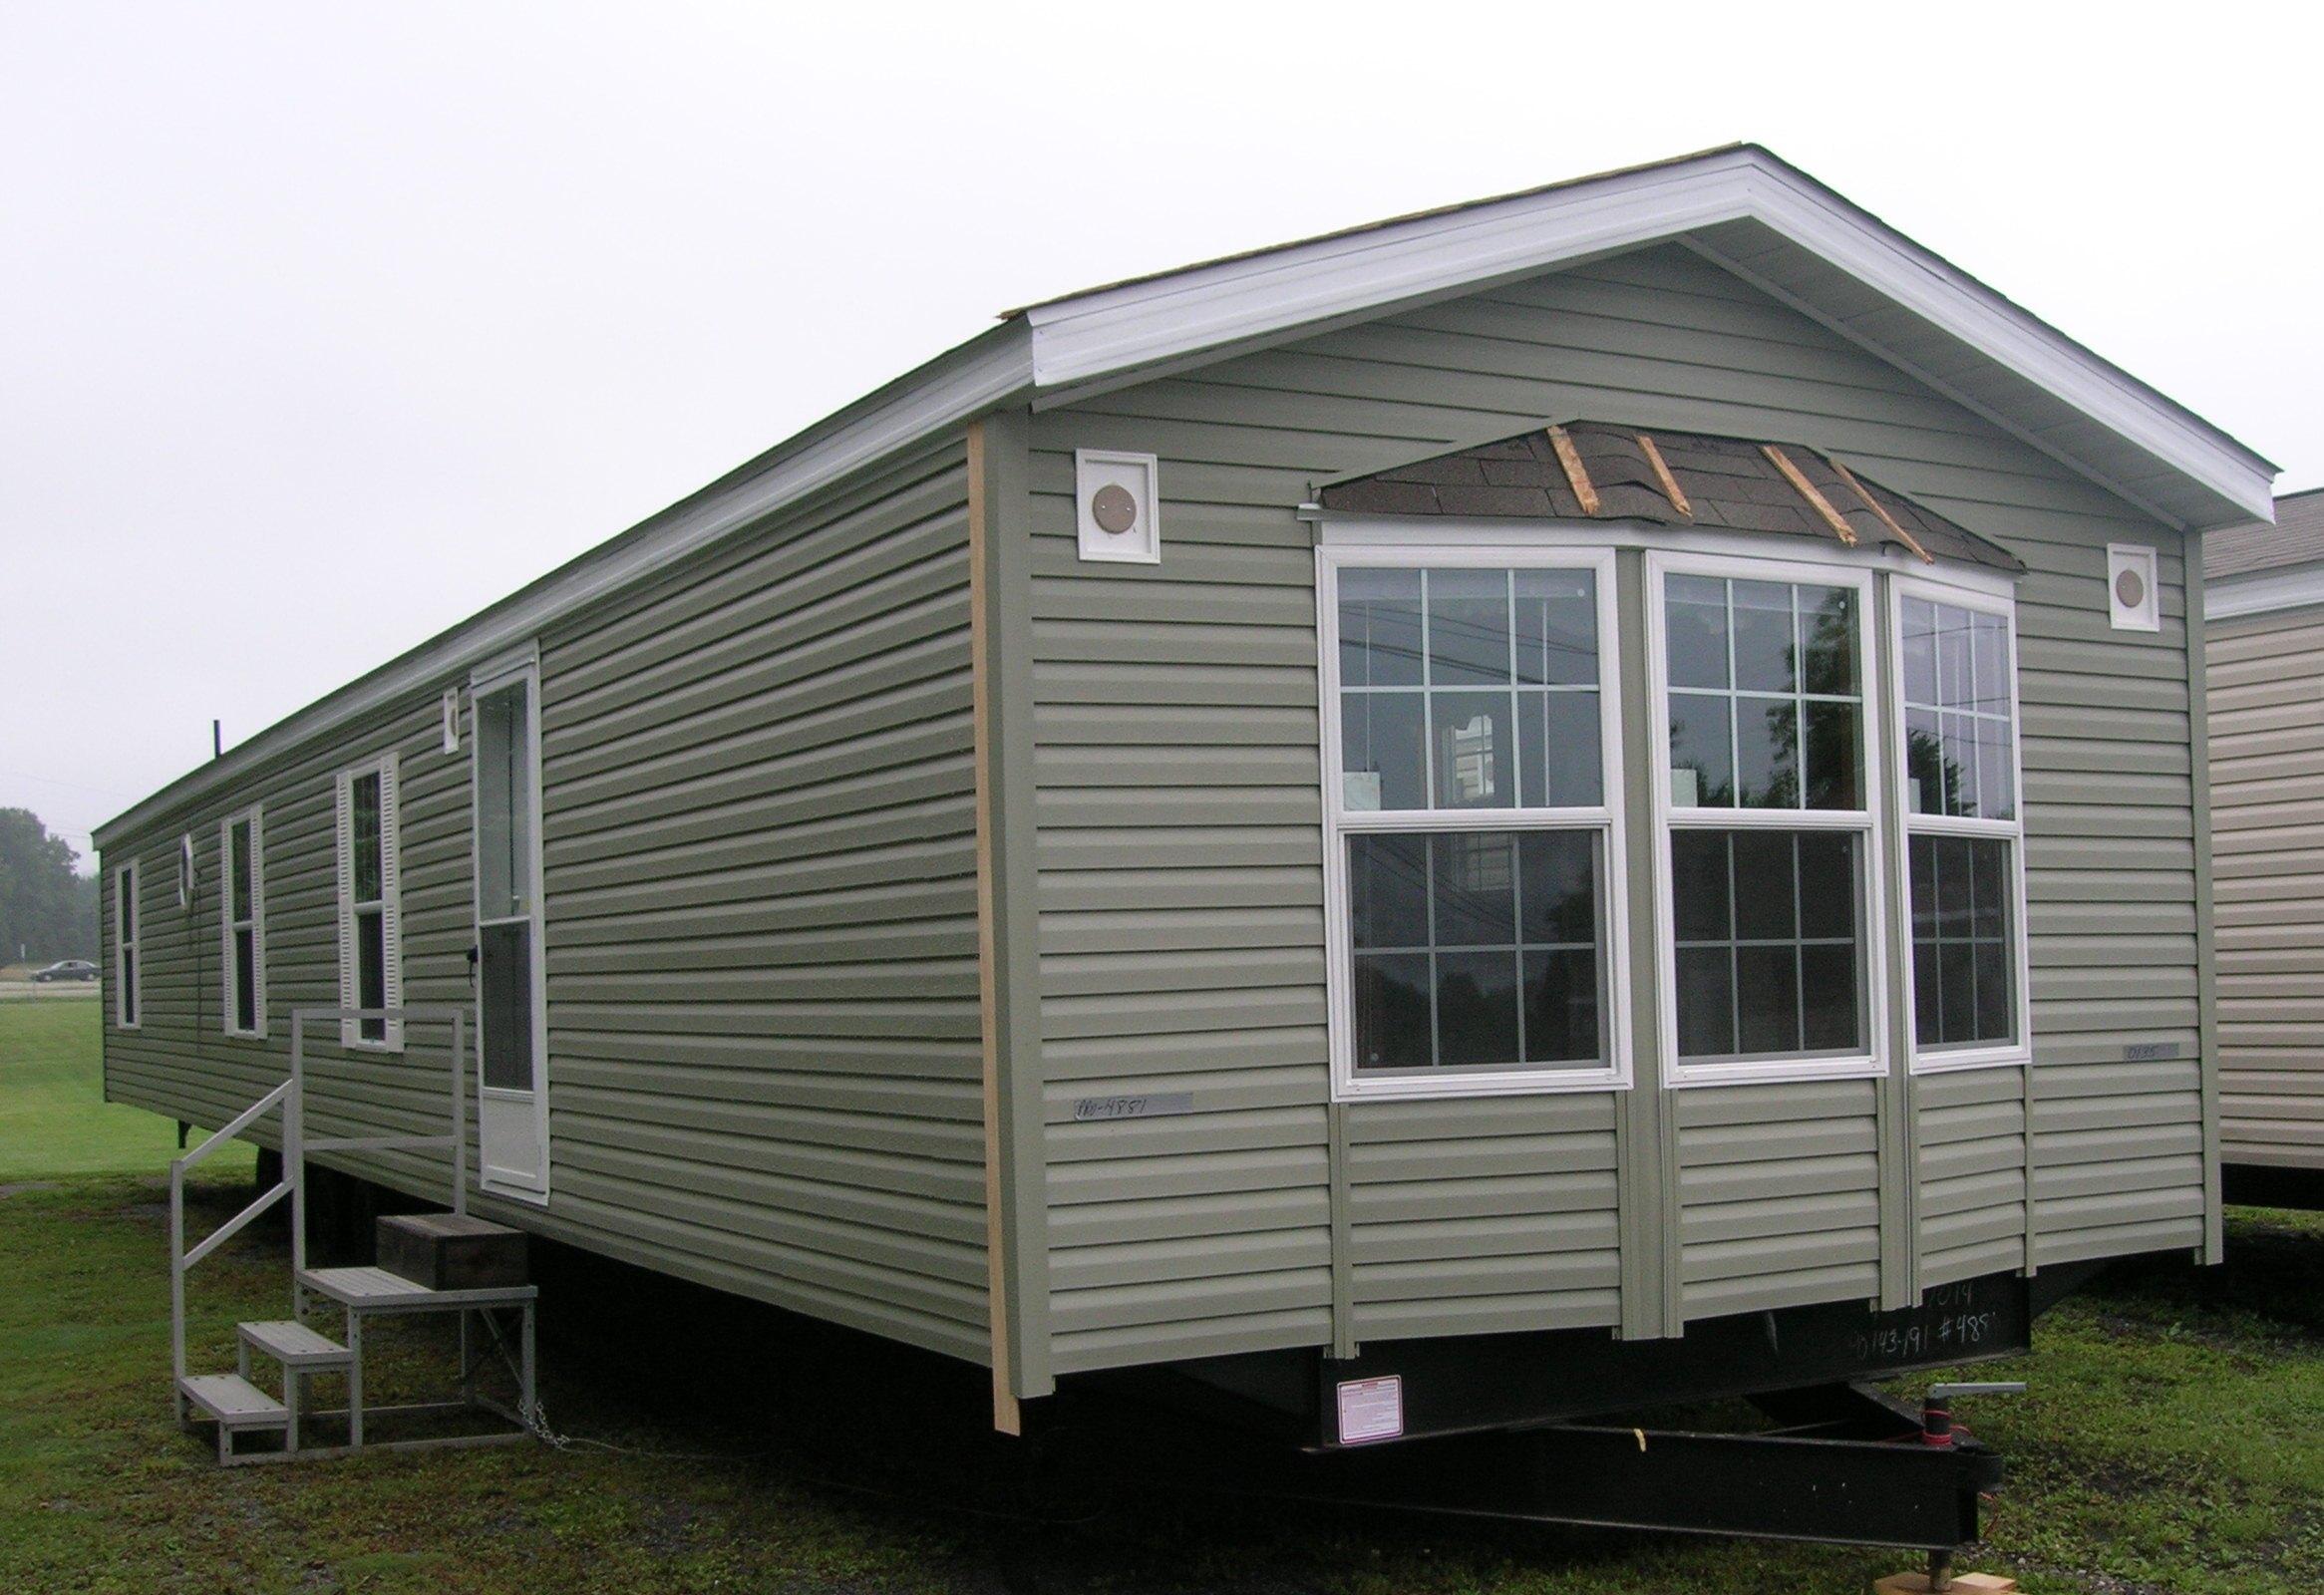 Steel Residential Homes roof tiles metal EPS sandwich roof wall